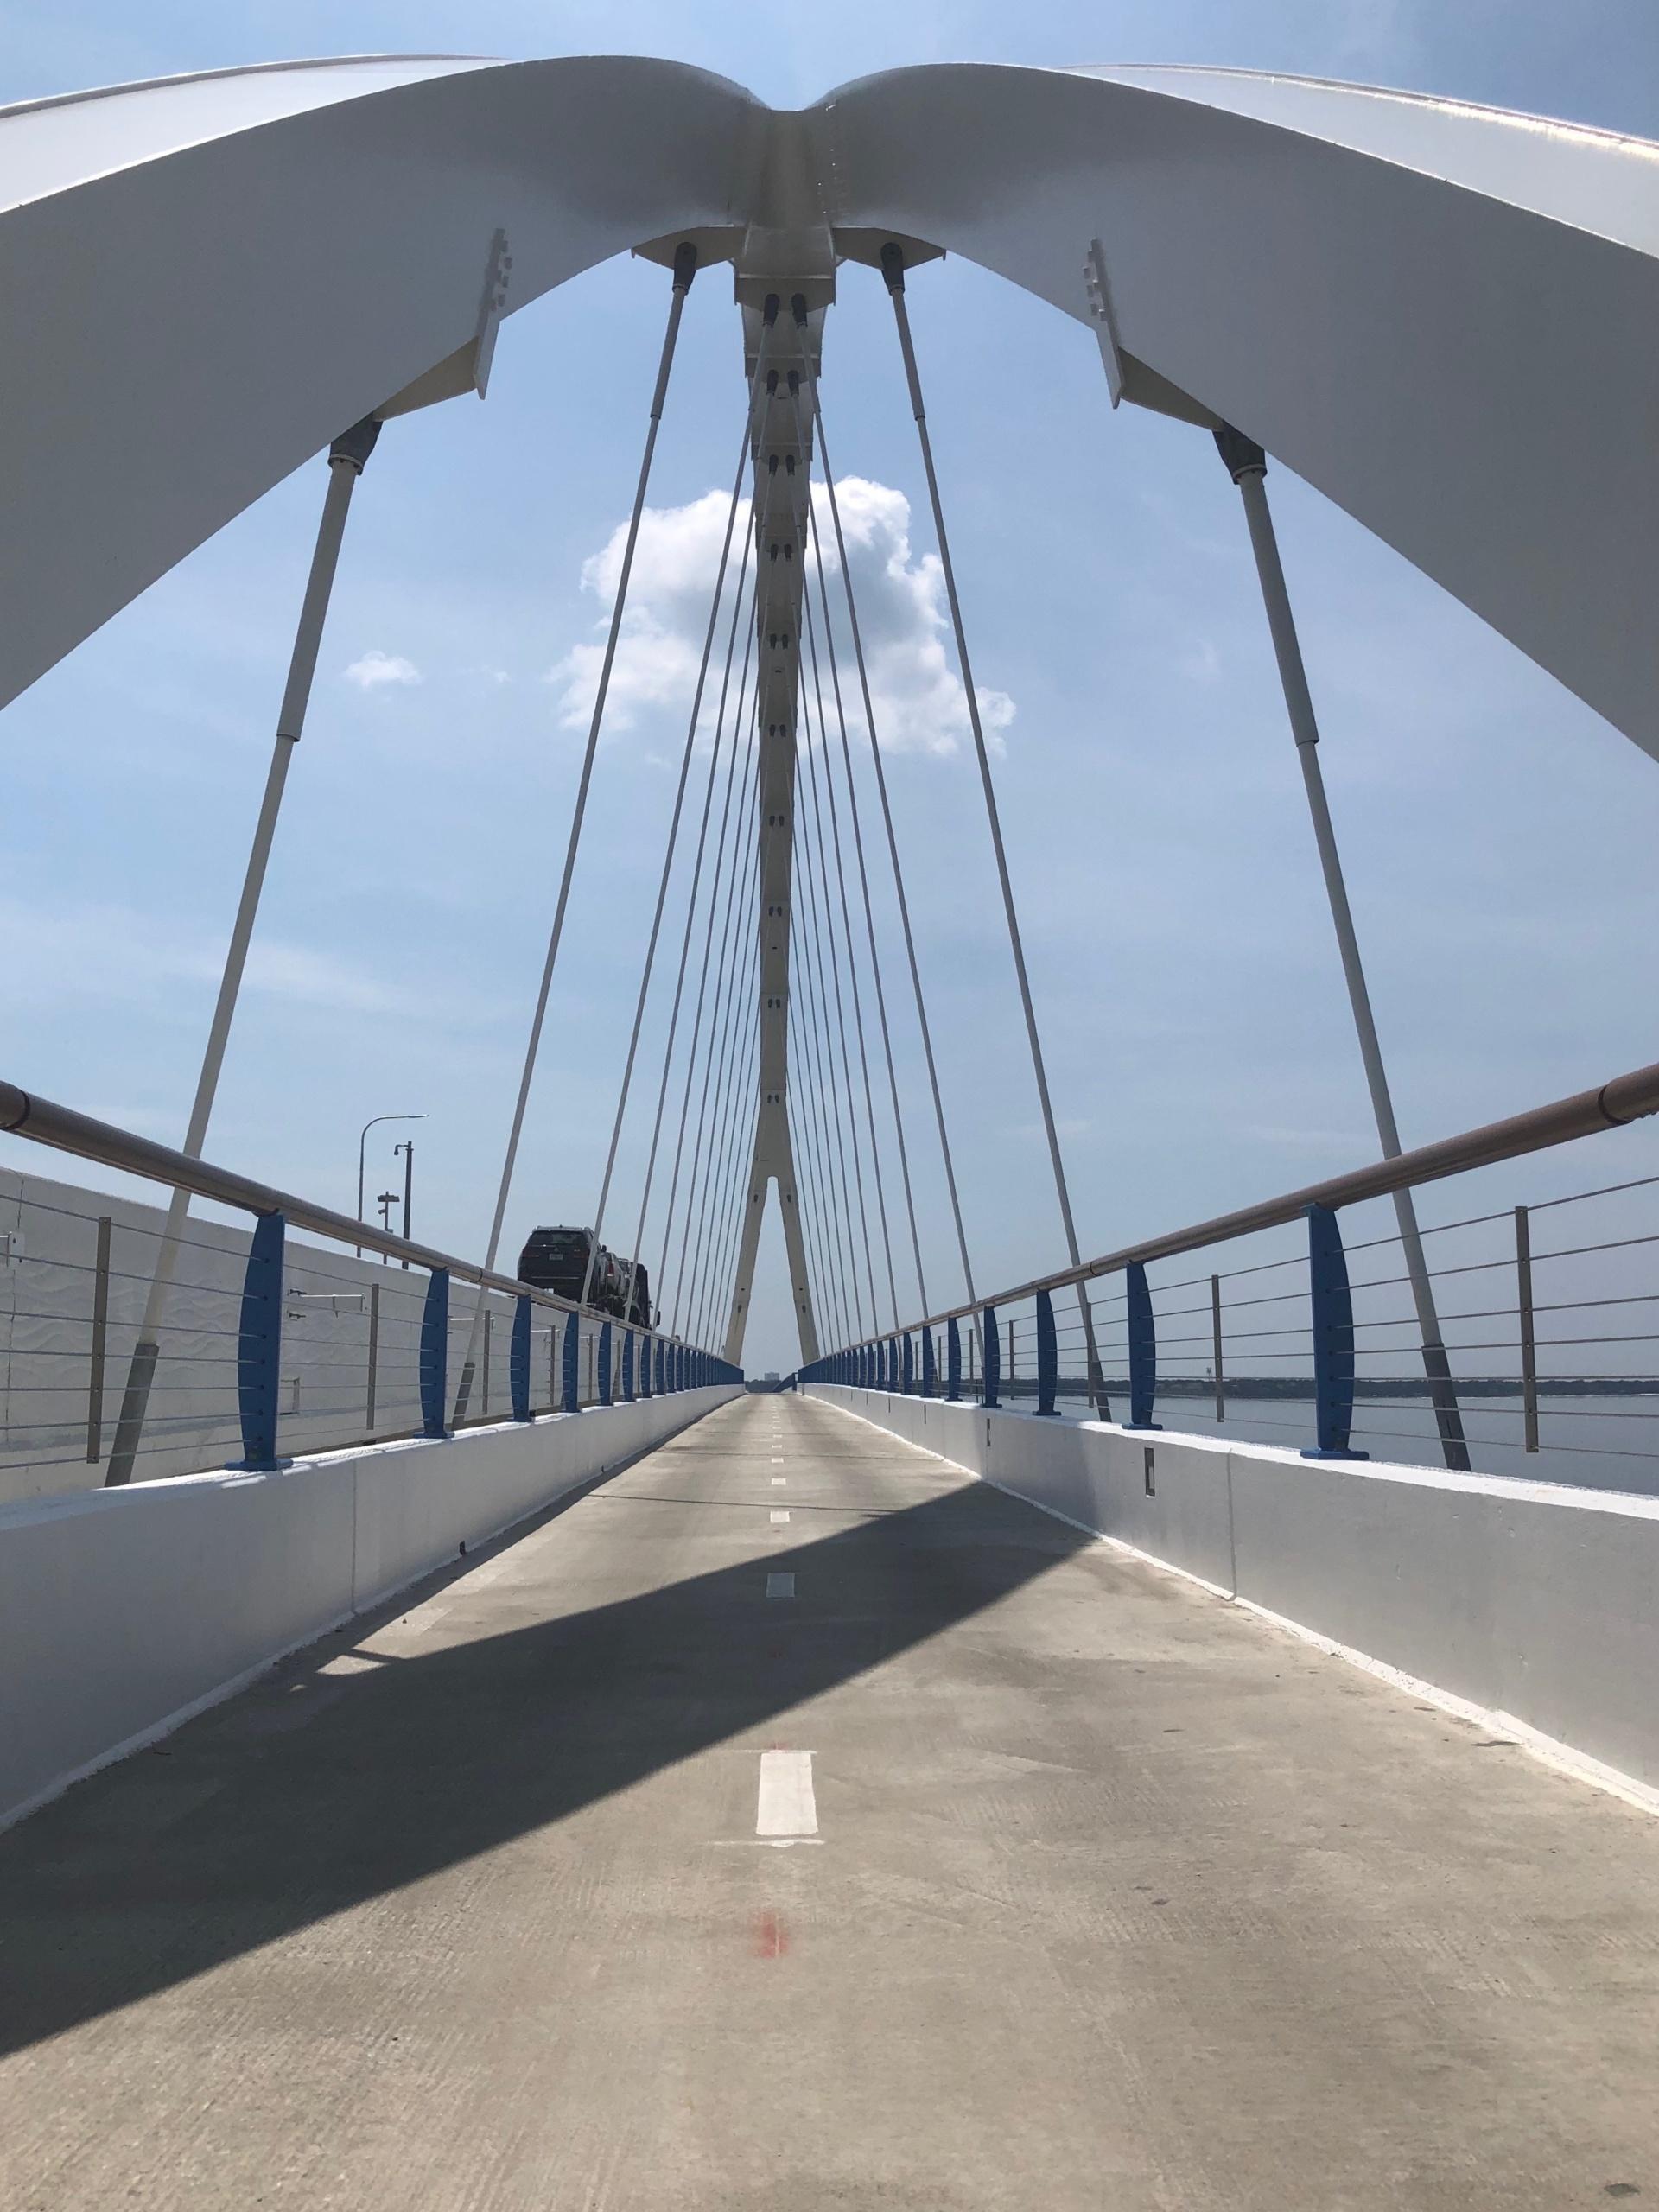 The Pensacola Bay Bridge multiuse path is now open